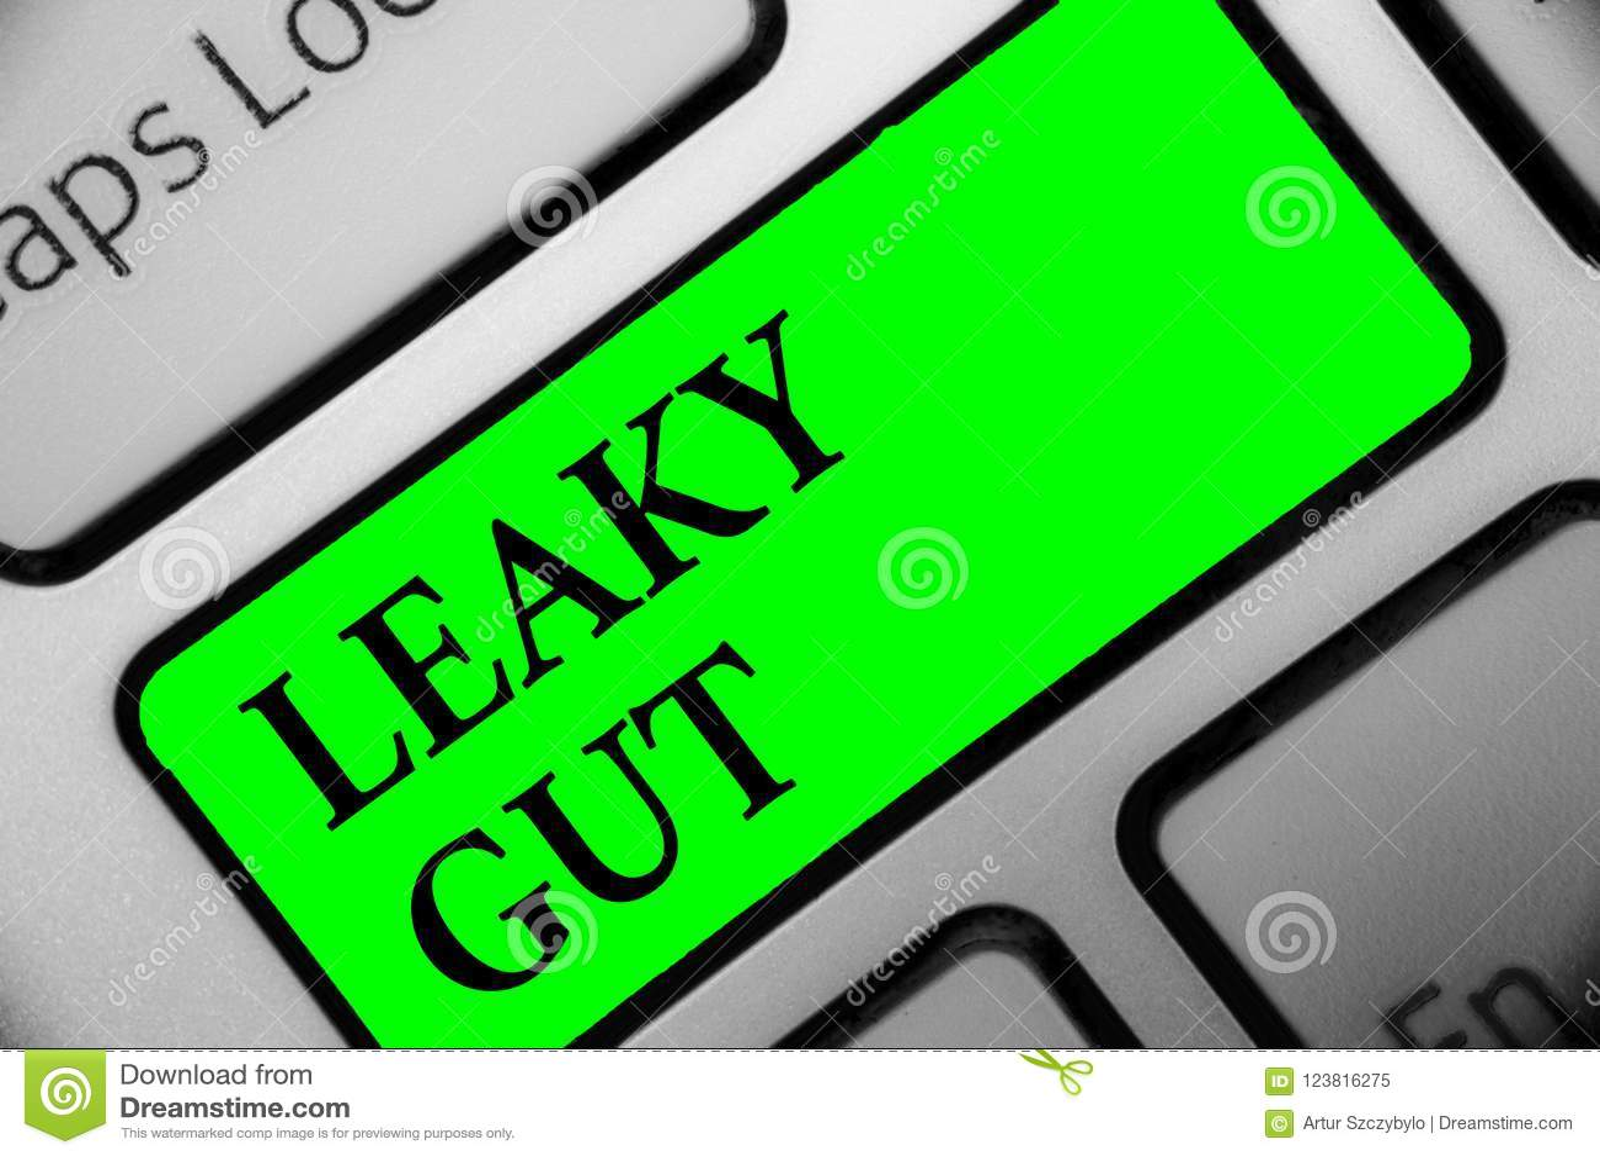 Leaky έντερο κειμένων γραφής Η έννοια που σημαίνει τον όρο Α στον οποίο η επένδυση του λεπτού εντέρου είναι χαλασμένη πληκτρολογε